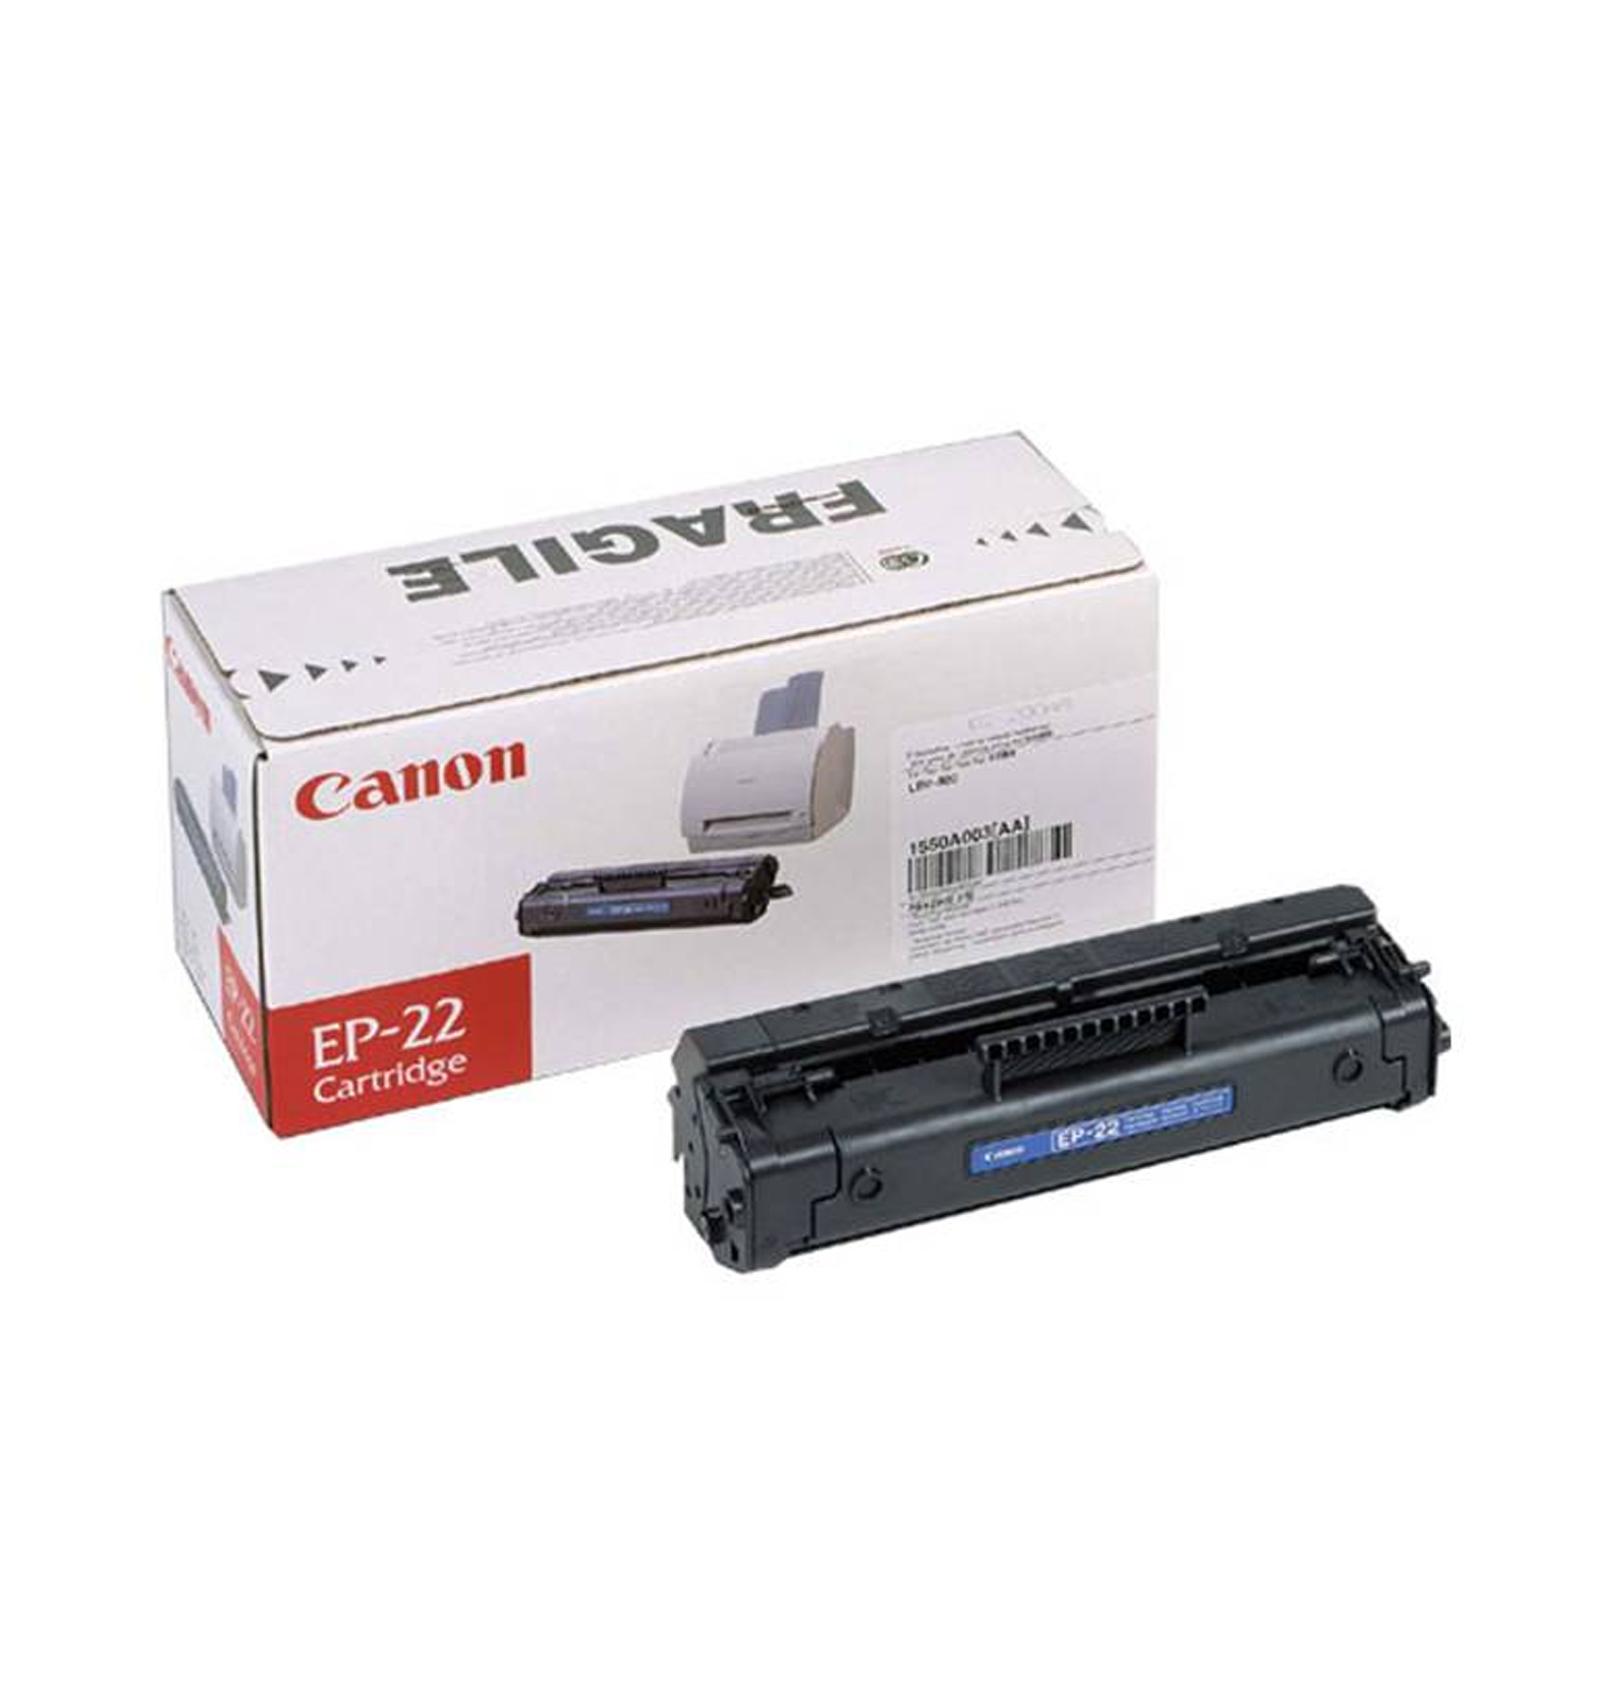 Заправка тонером картриджа Canon EP-27 для Laser Shot LBP 3200, Laser Base MF3110 MF5630/5650/5730/5750/5770